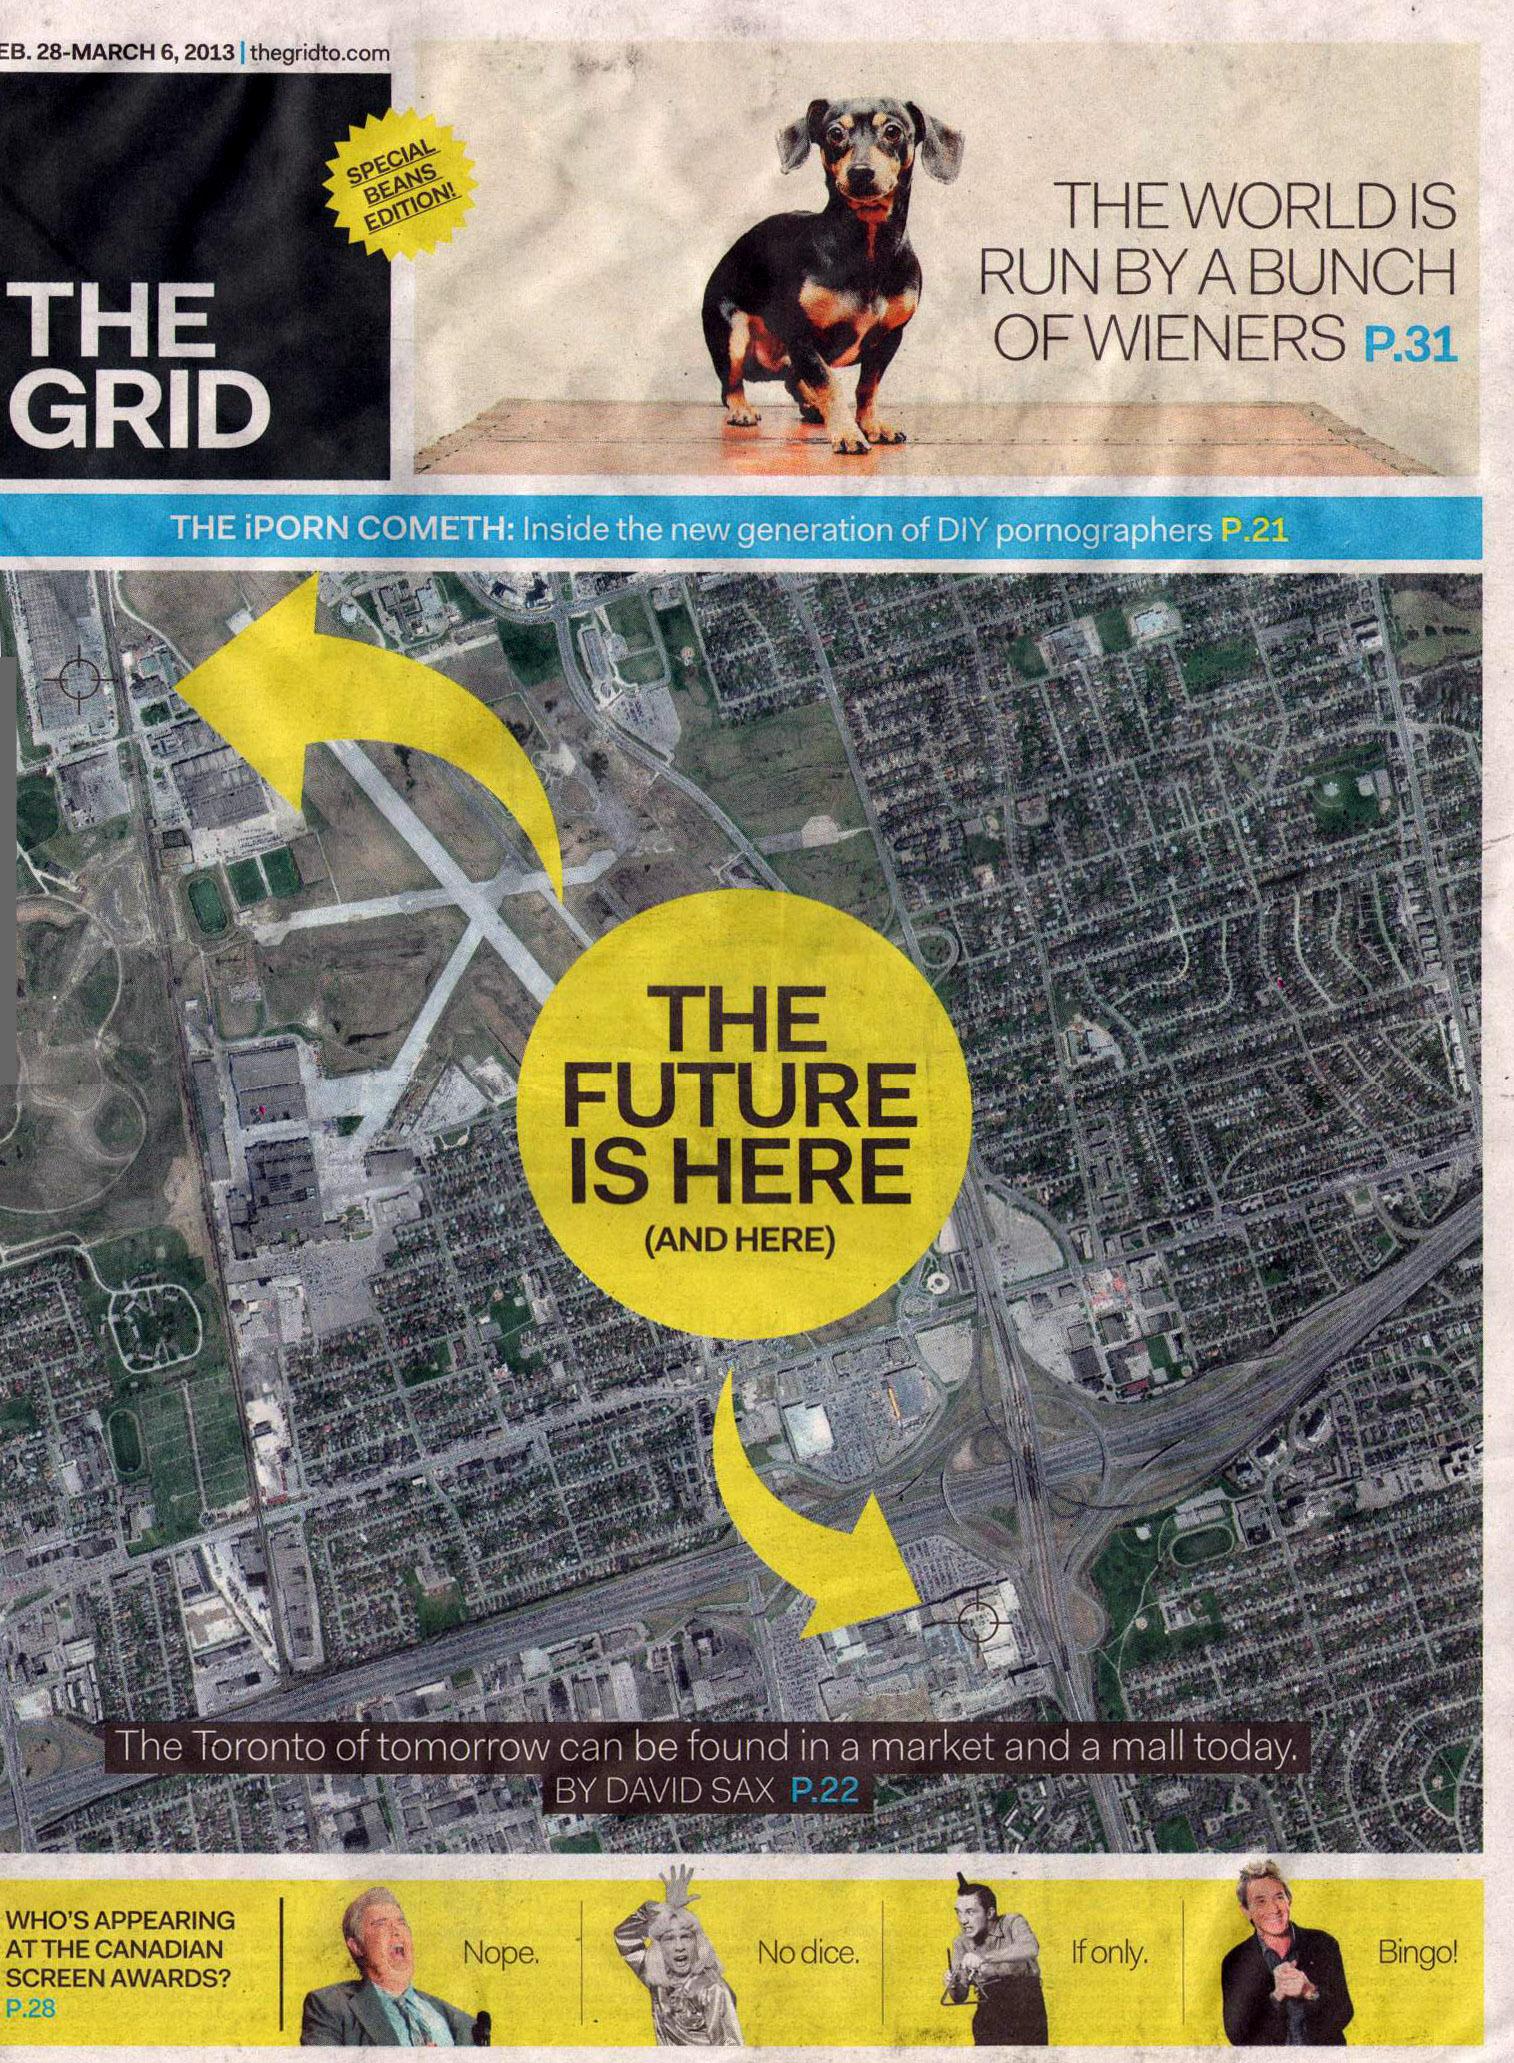 Cover_TheGrid_Feb_28-March_6_2013.jpg